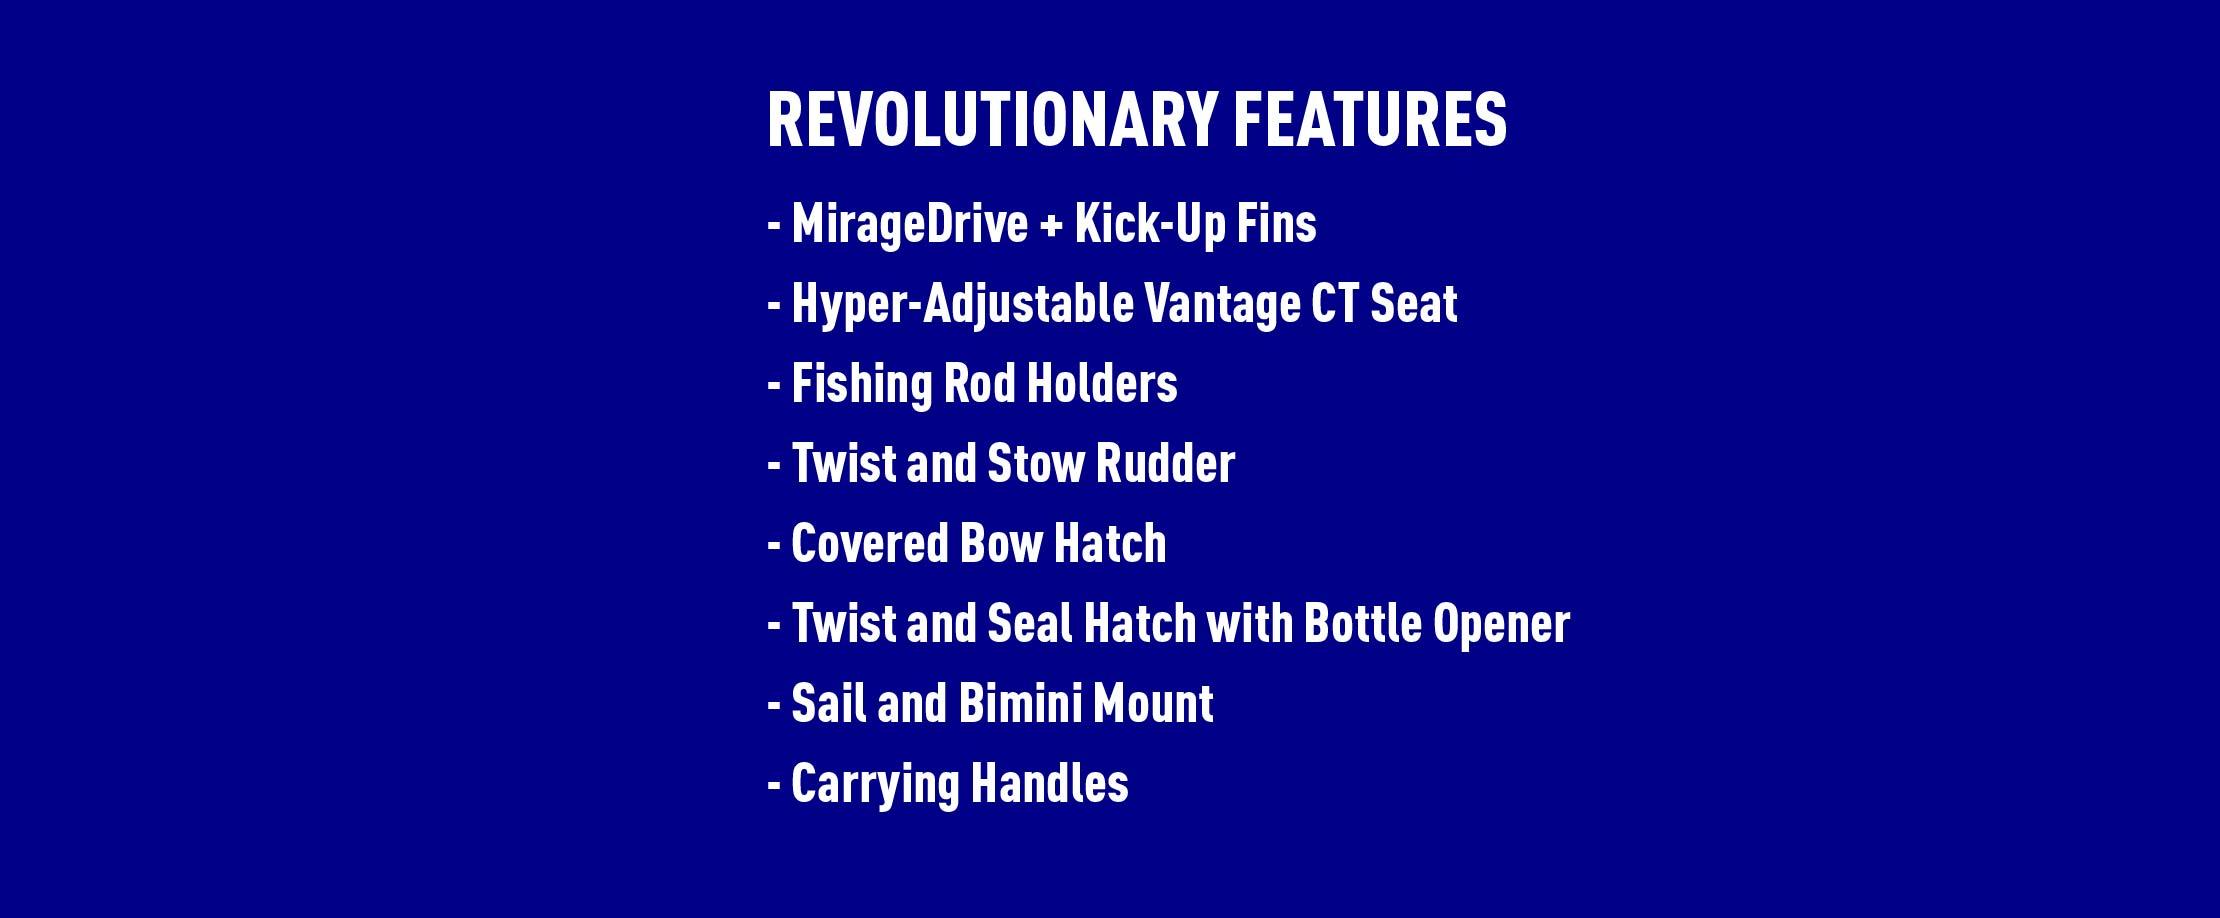 Mirage Revolution 11 Features